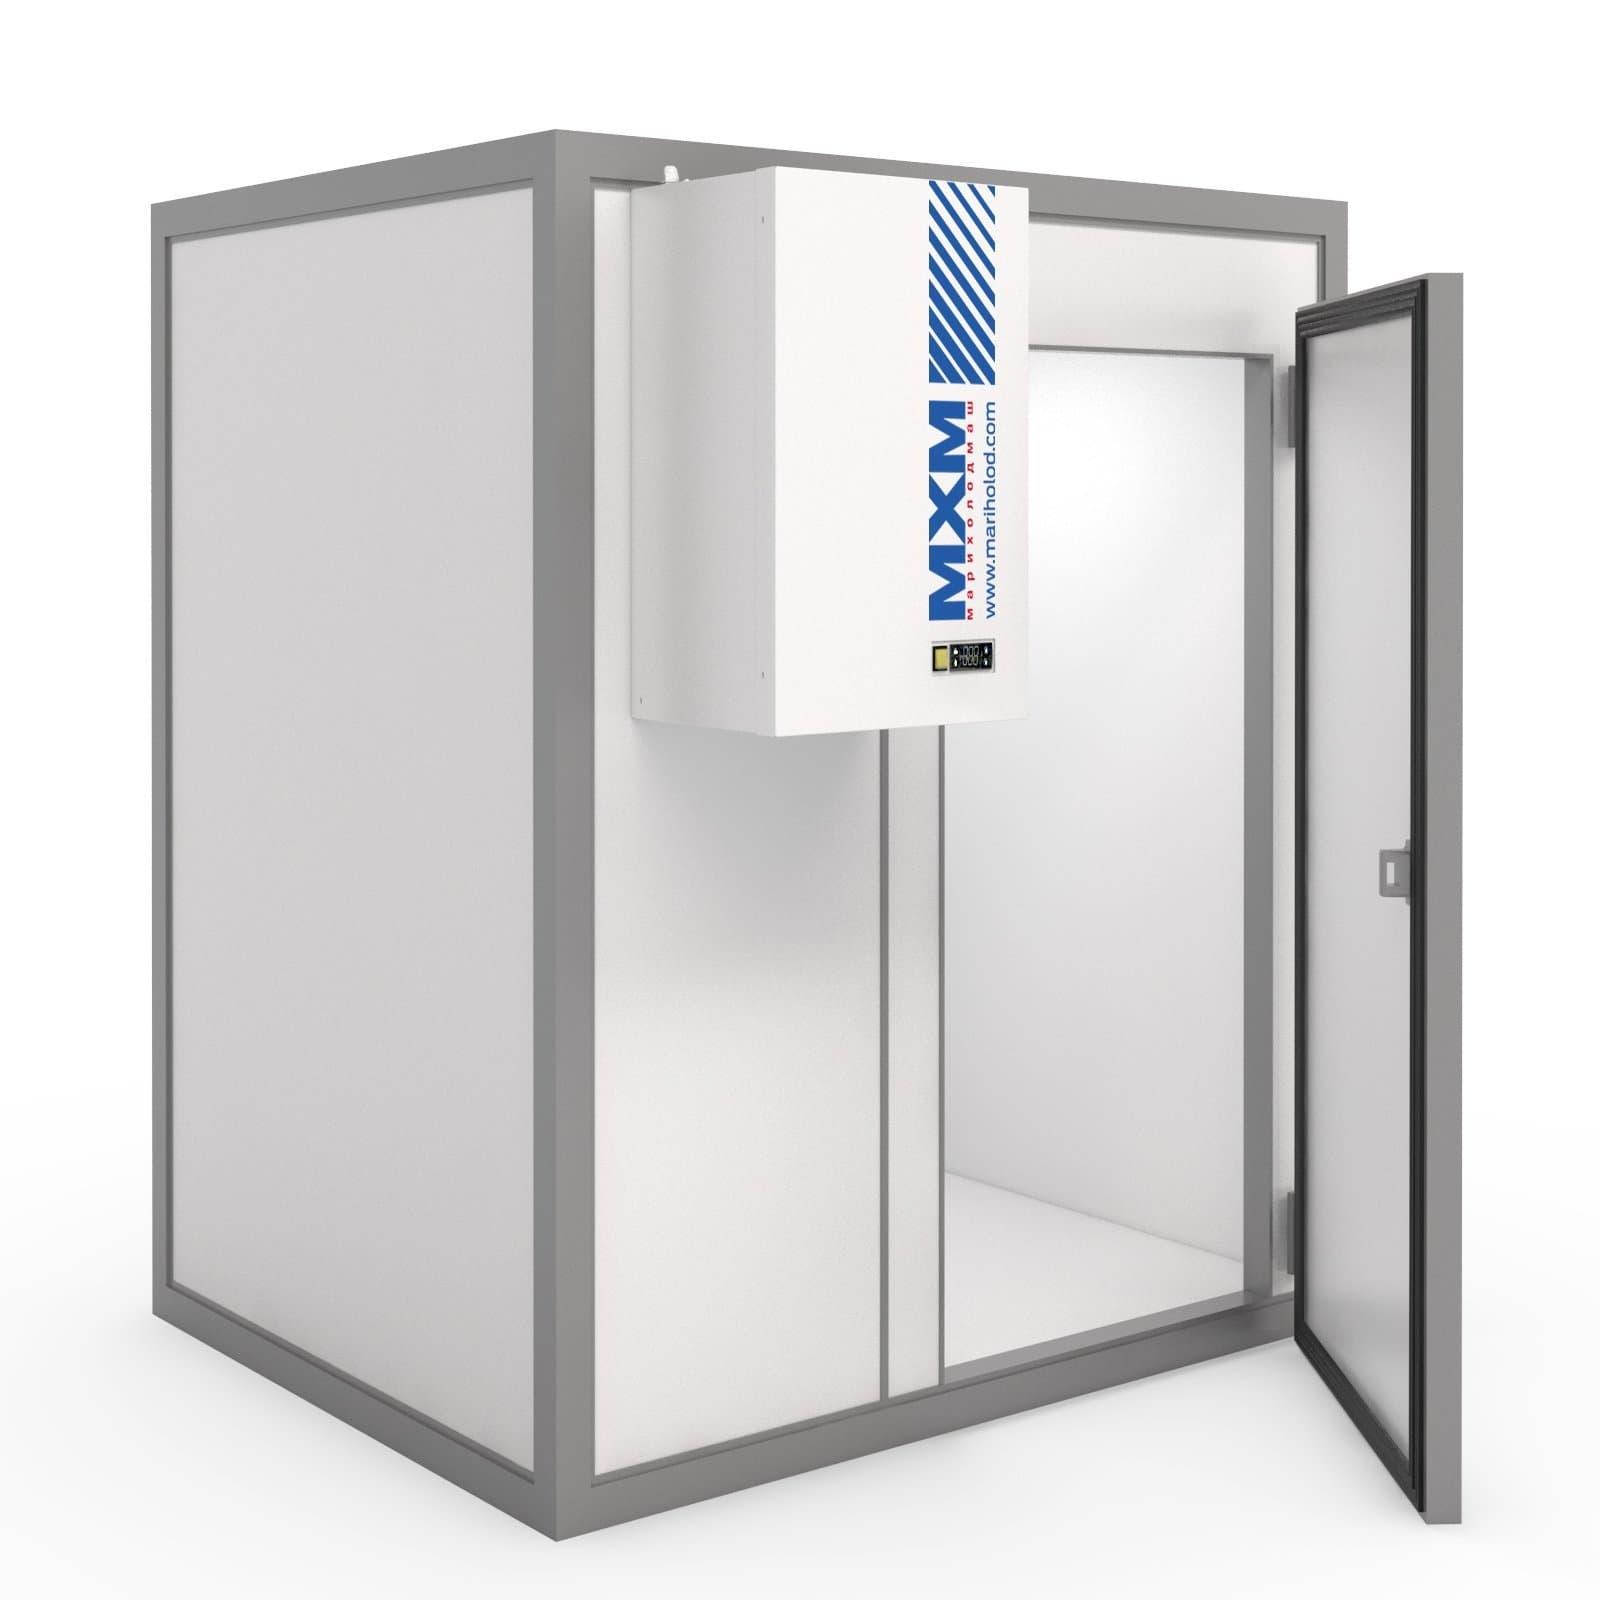 Камера холодильная КХН-64,51 (2560×10660×2720 мм)